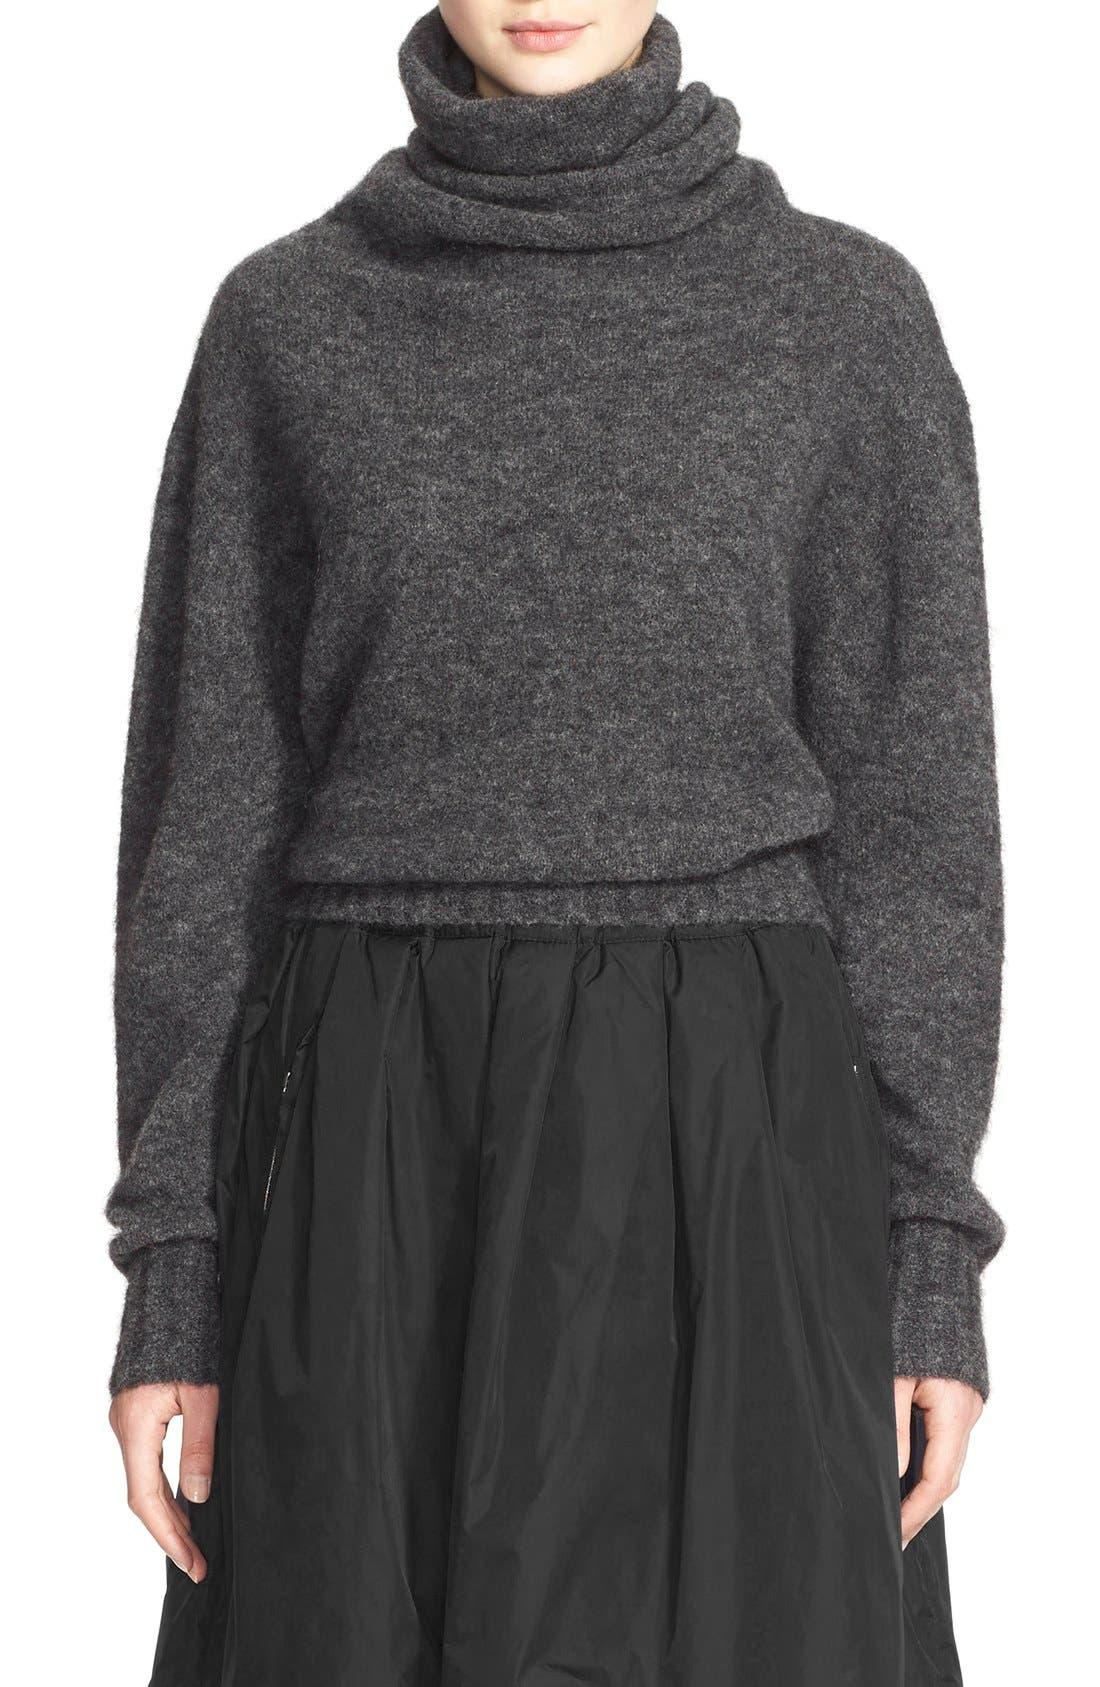 'Voletta Mohair' Turtleneck Sweater,                             Main thumbnail 1, color,                             021